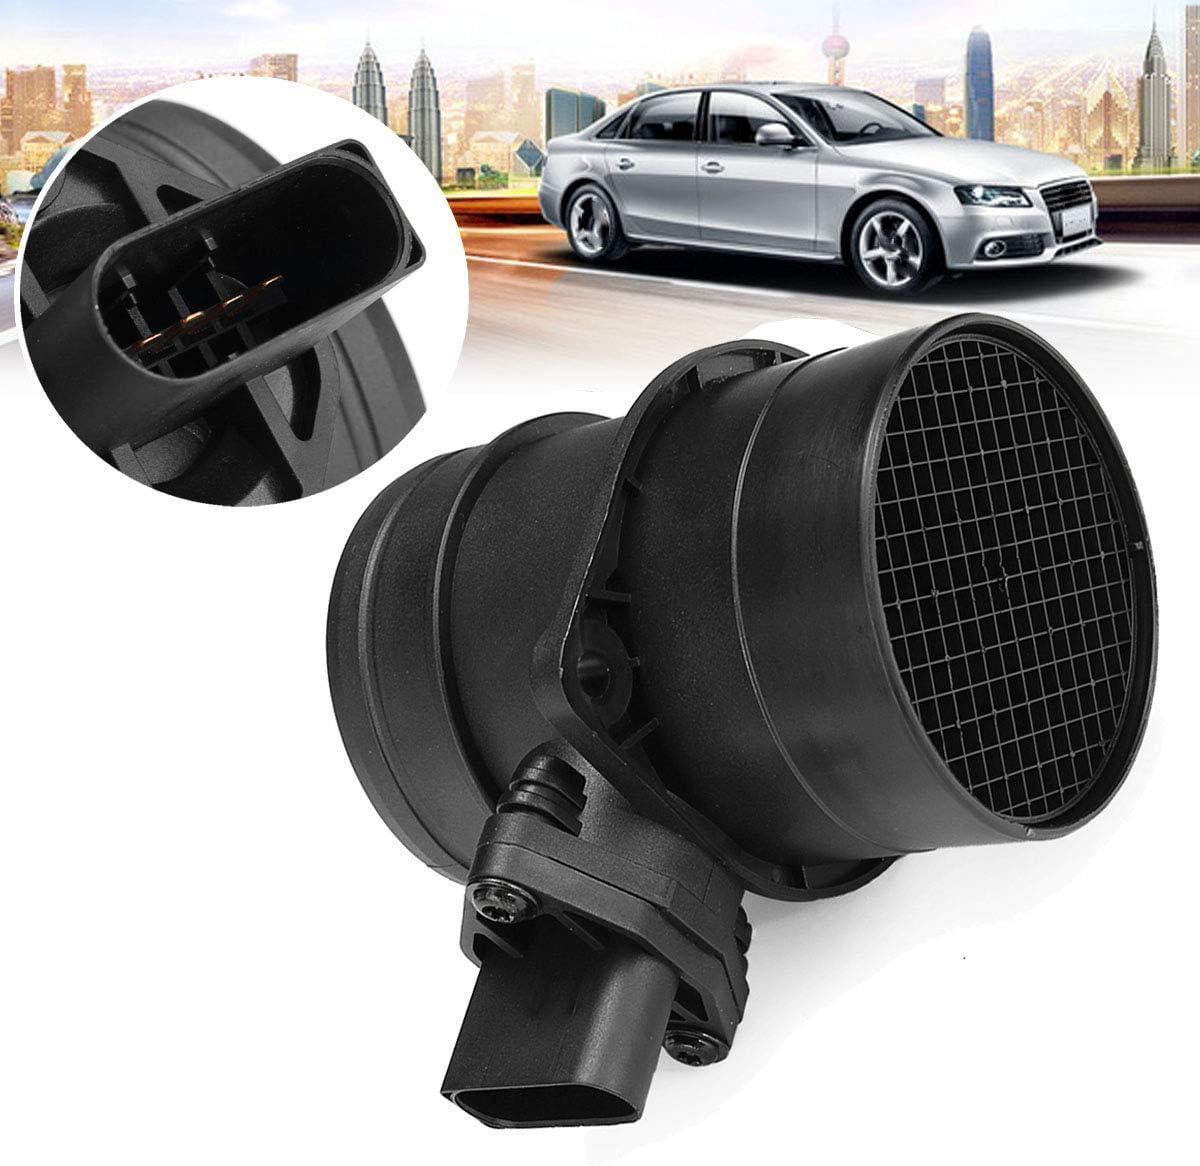 071906461B Mass Air Flow Meter For Very popular Kansas City Mall Volkswagen Sensor 0280218017